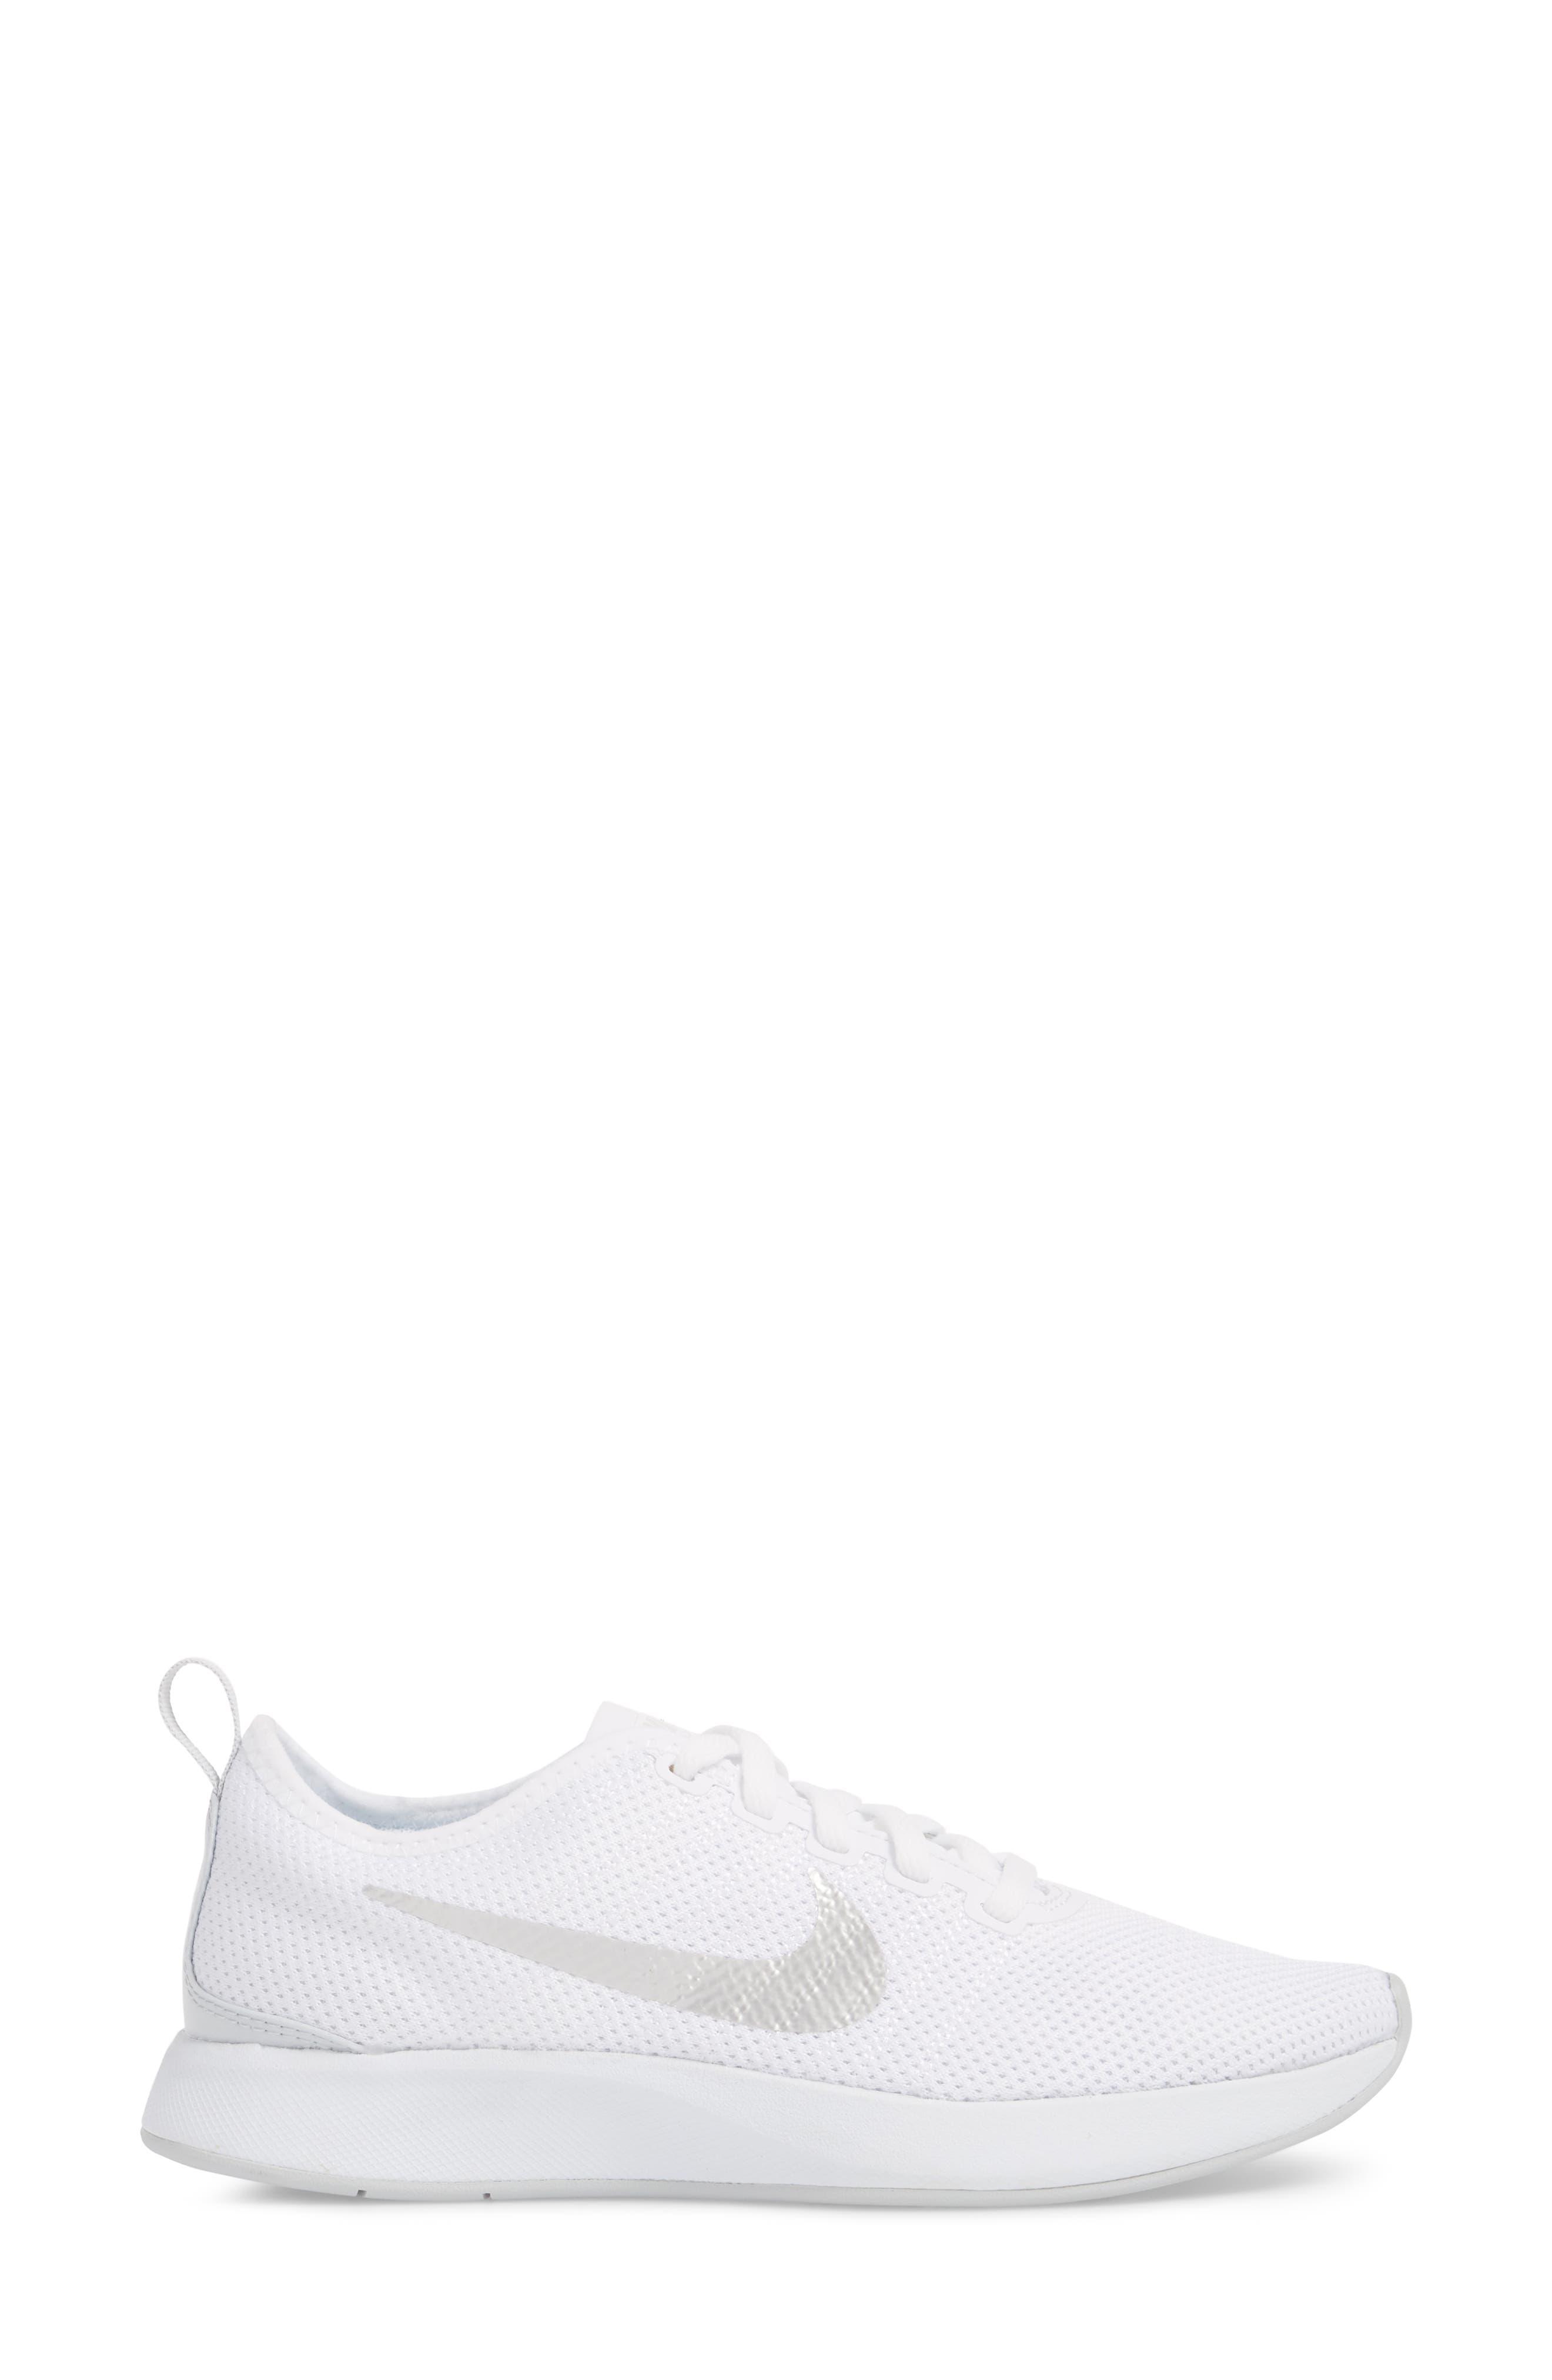 Dualtone Racer Running Shoe,                             Alternate thumbnail 3, color,                             White/ Pure Platinum